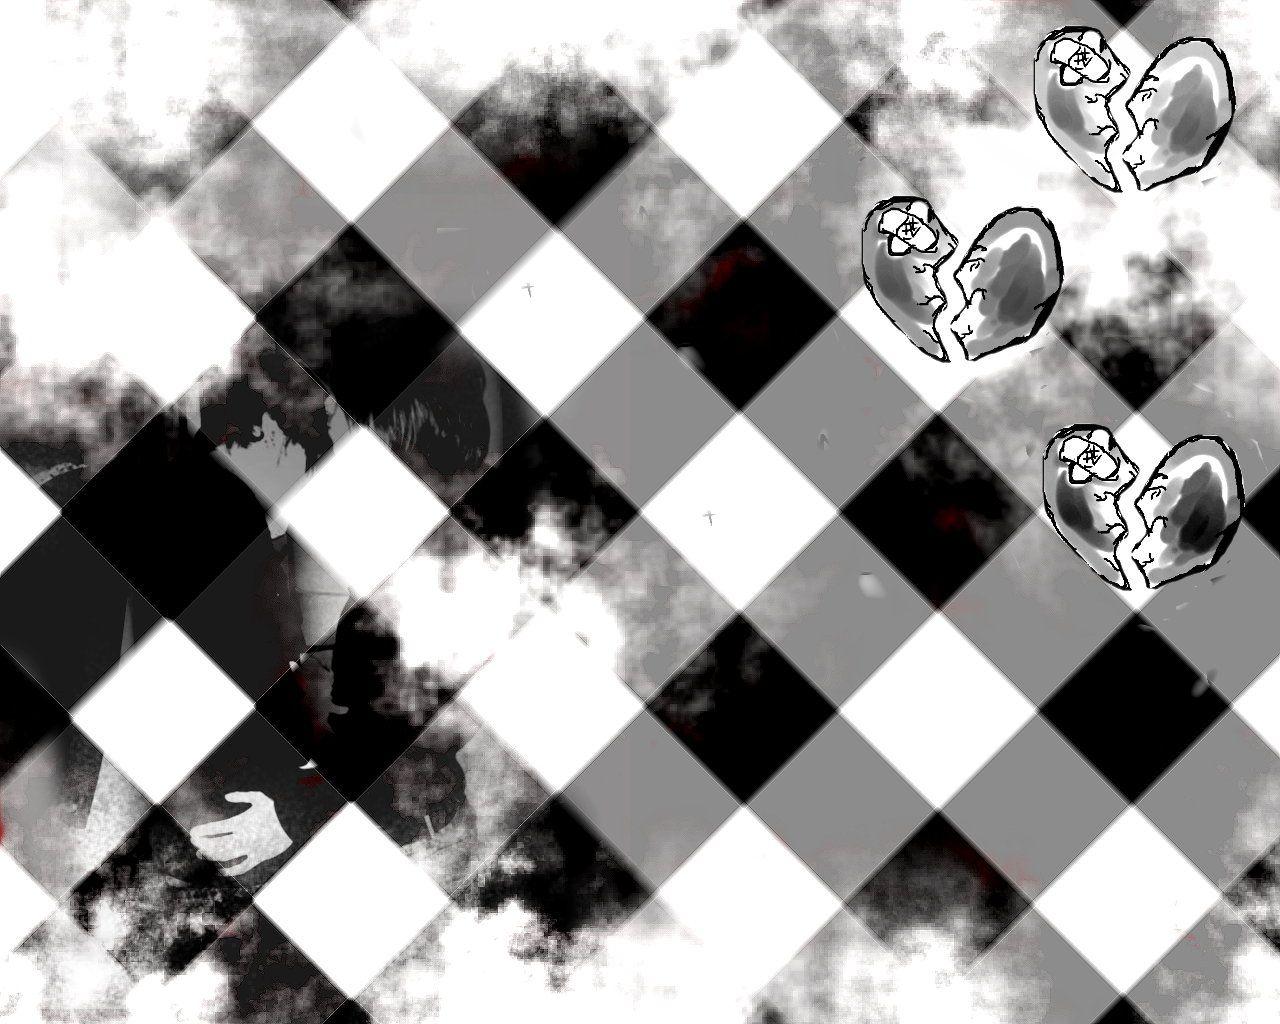 Papel De Parede Emo Xadrez Wallpaper Para Download No Celular Ou